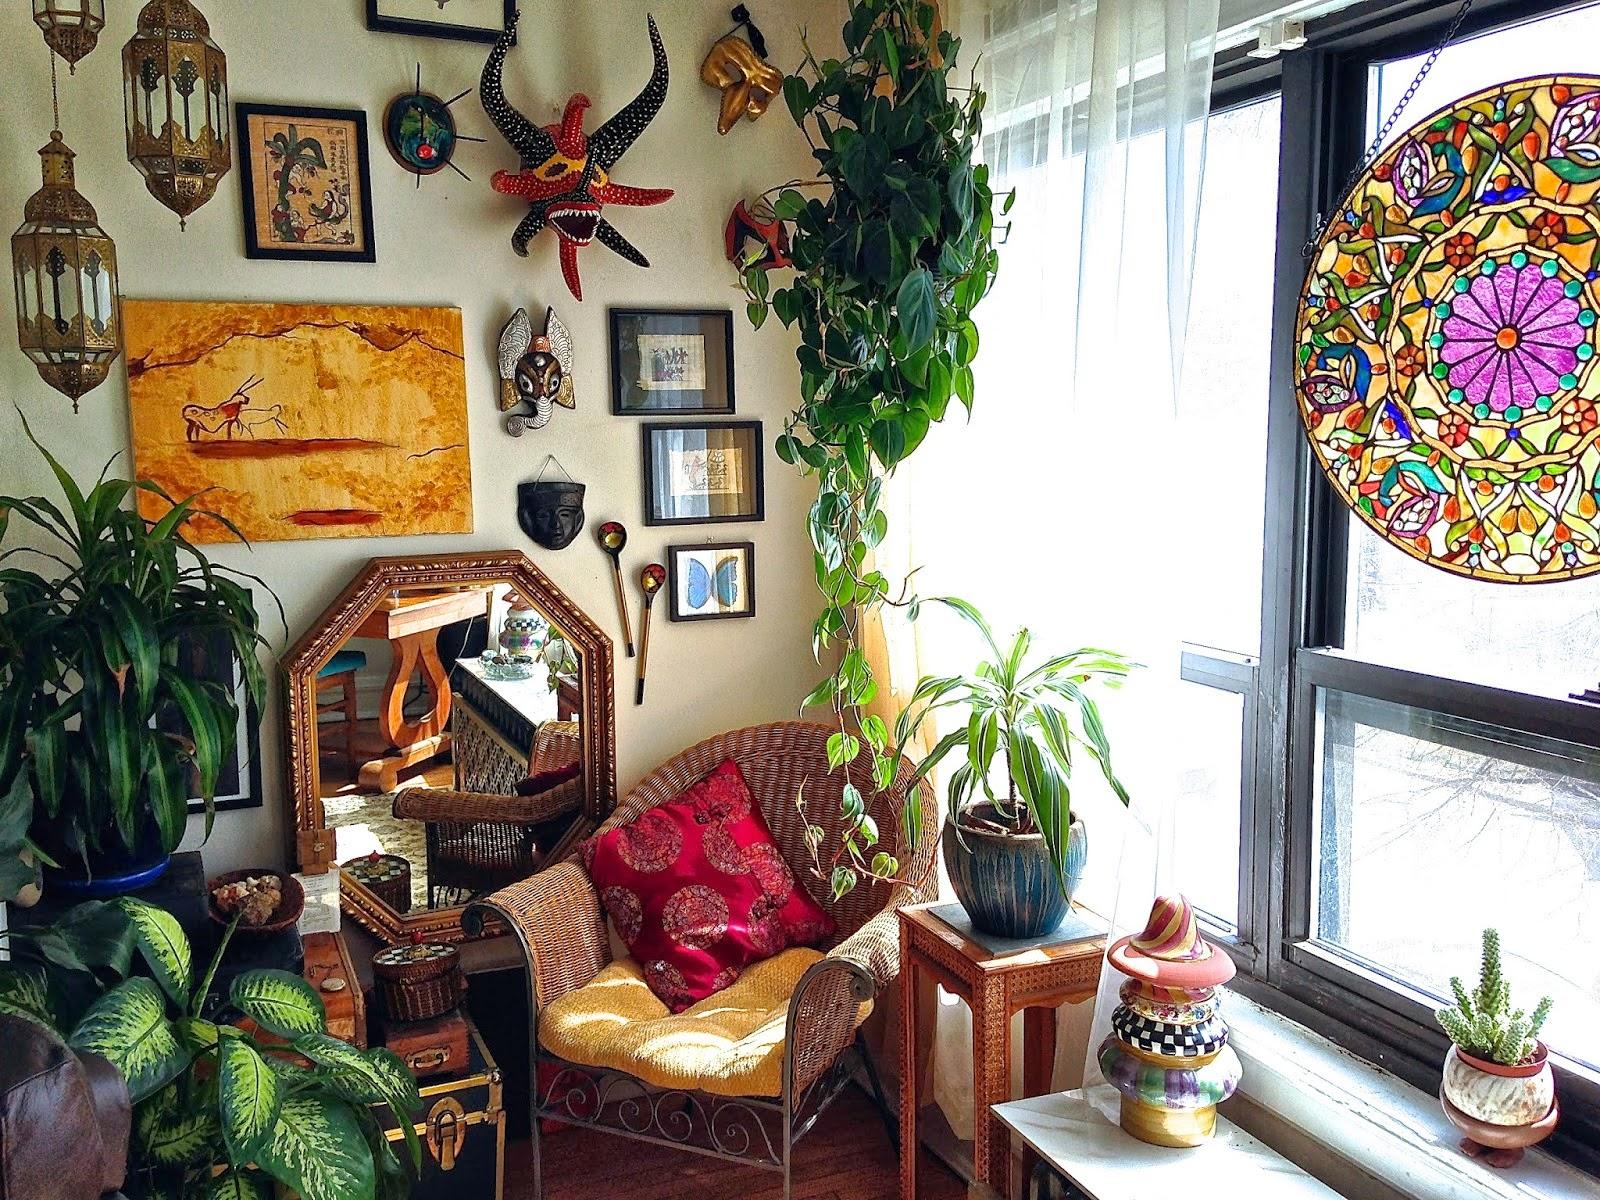 GYPSY YAYA Ms Tungstens Jewel Toned Abode